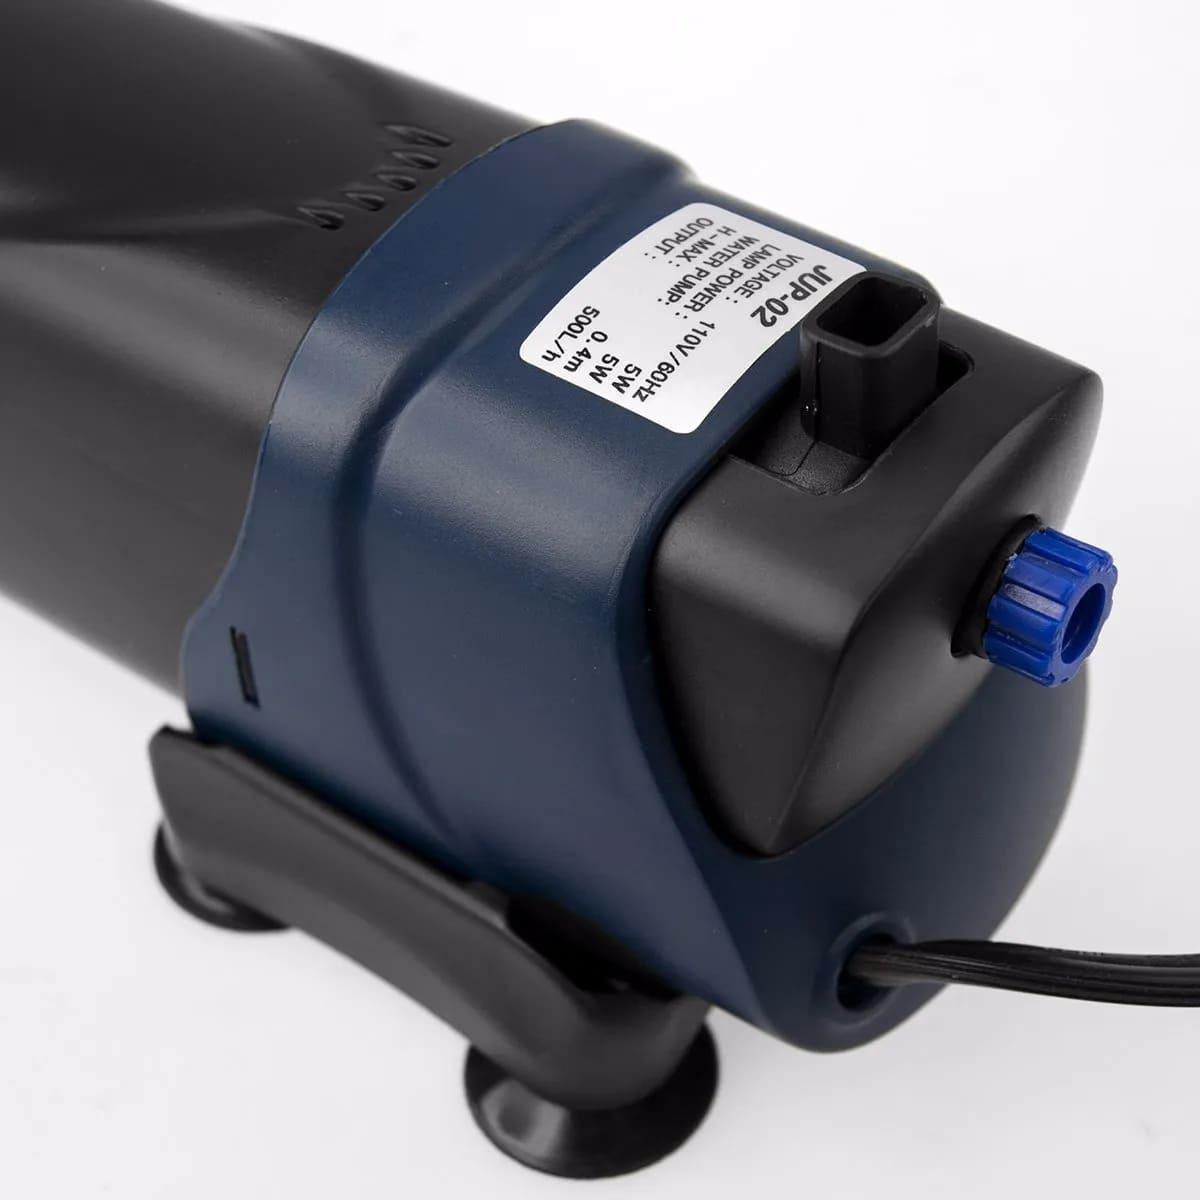 Filtro Interno Sunsun Jup-02 Uv 5w 500l/h 220v Aquarios